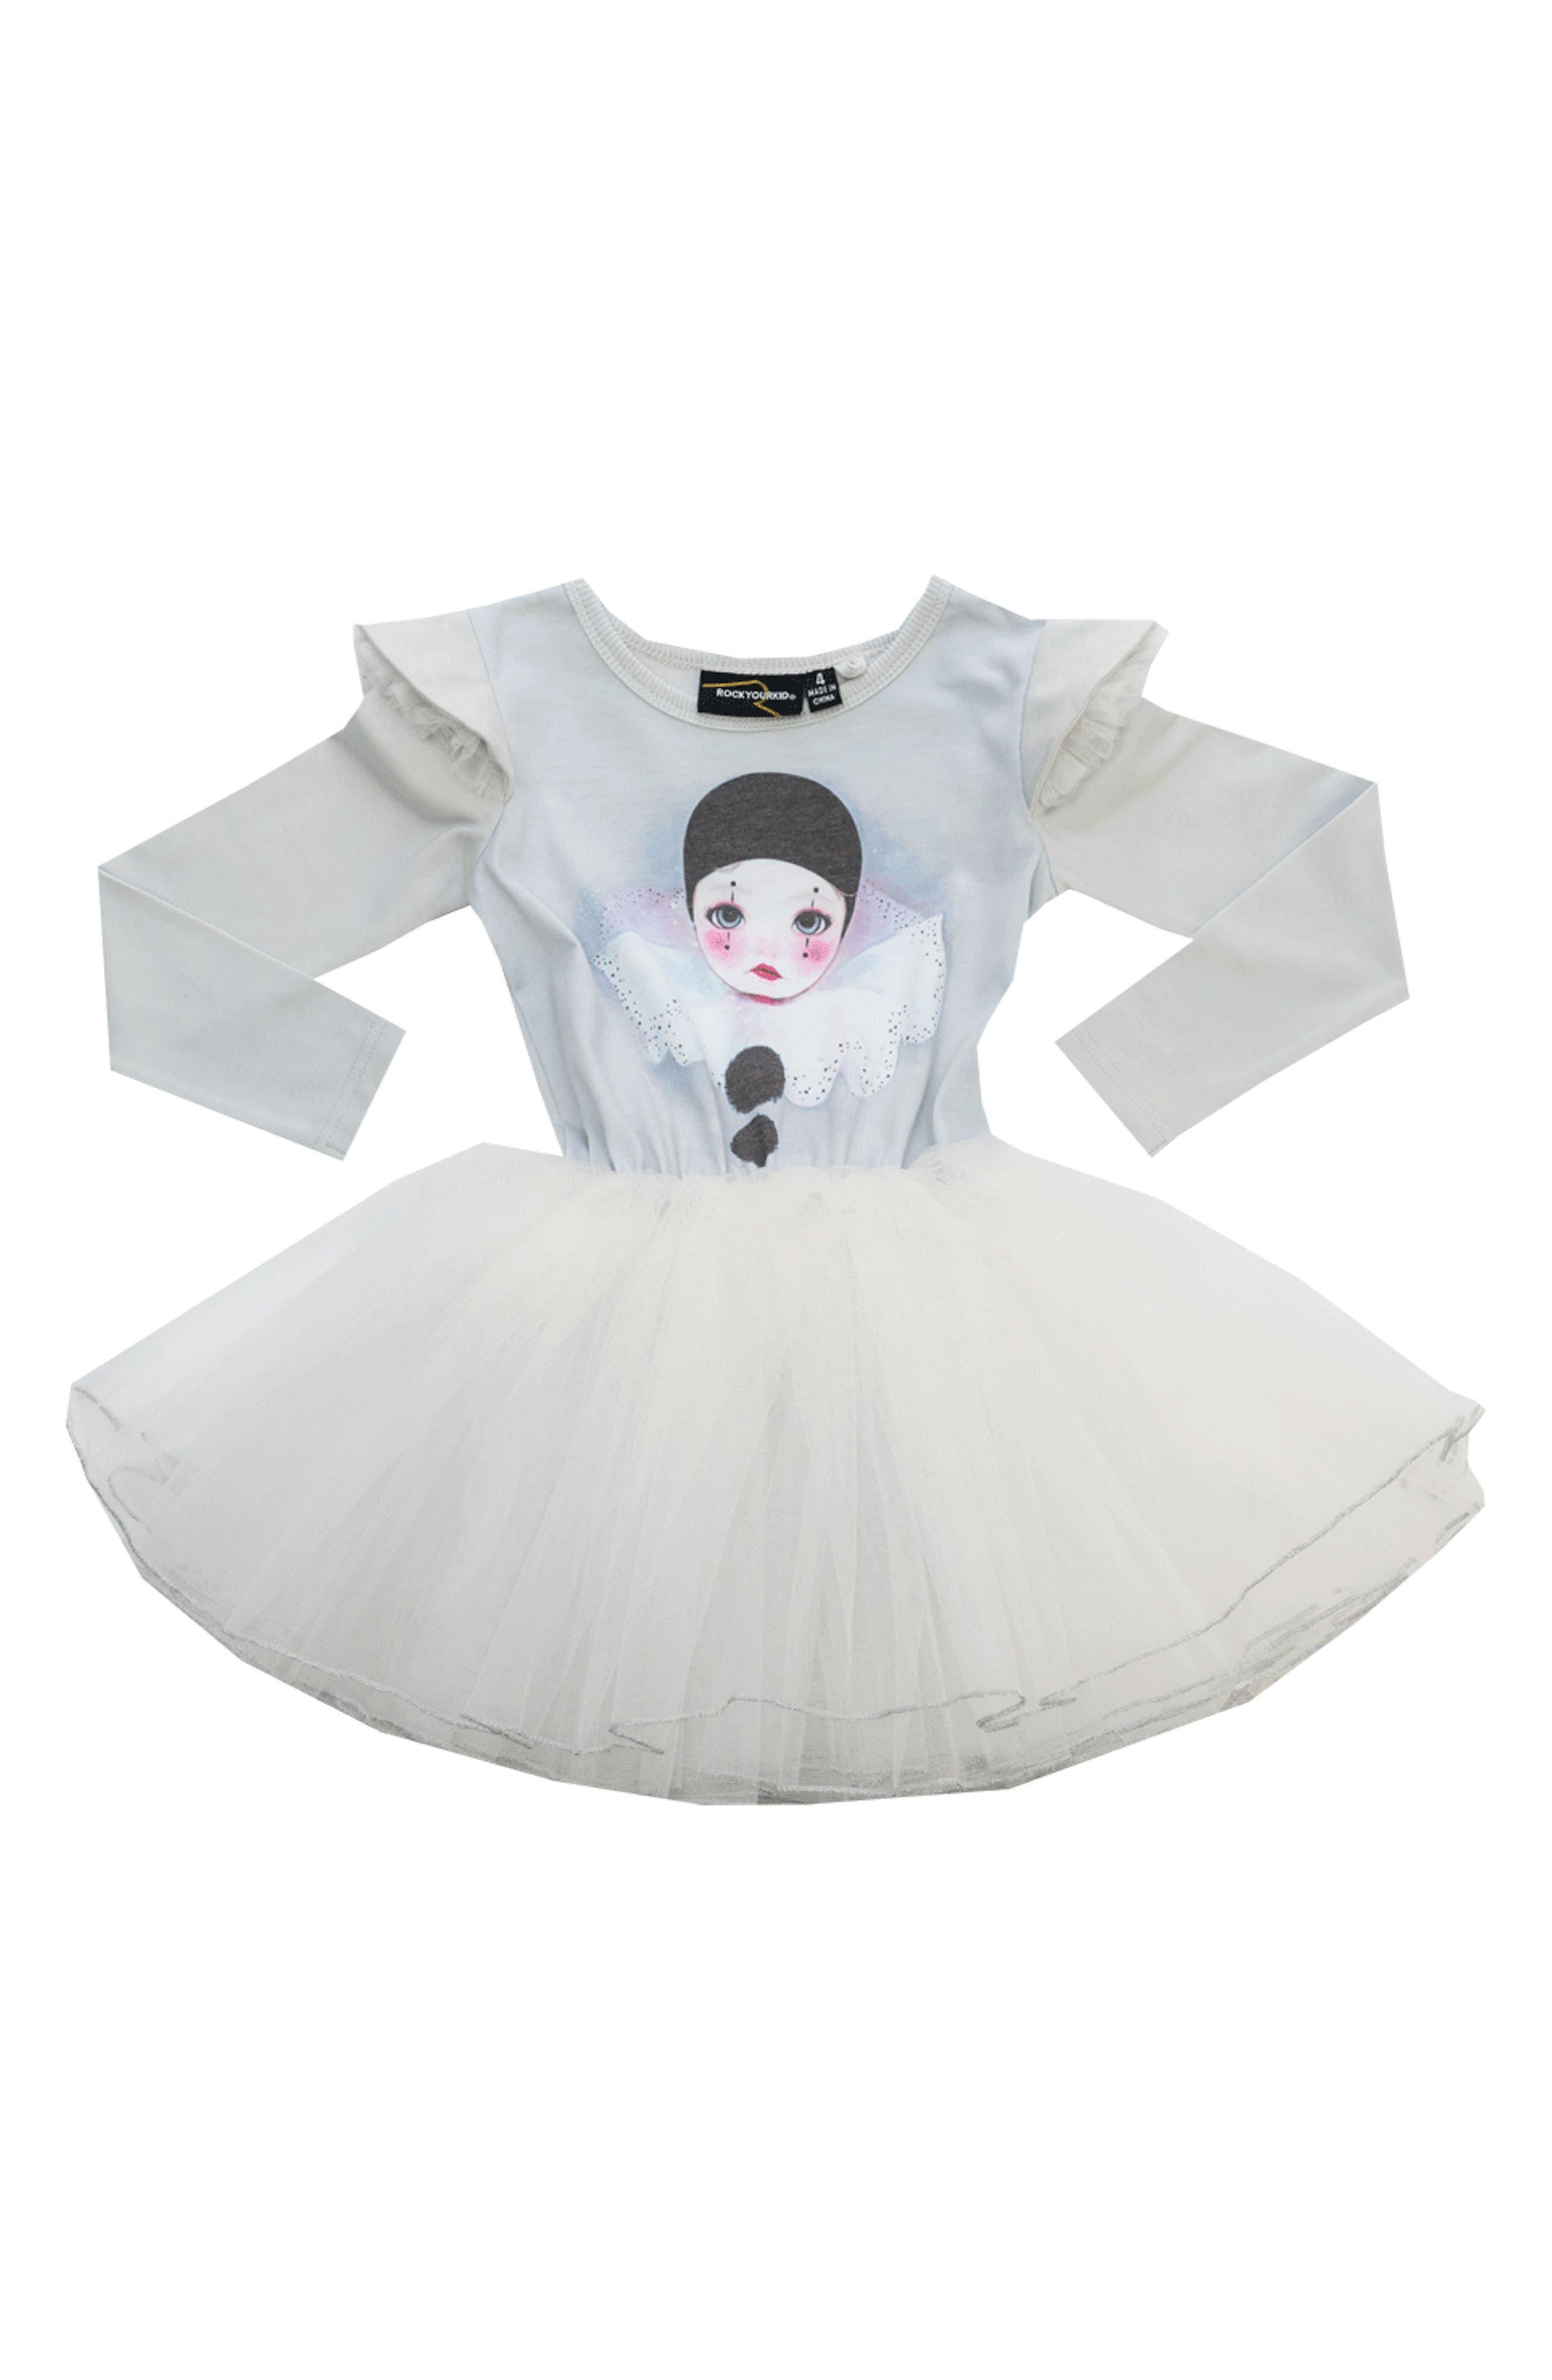 Pierrot Circus Dress,                             Main thumbnail 1, color,                             Silver